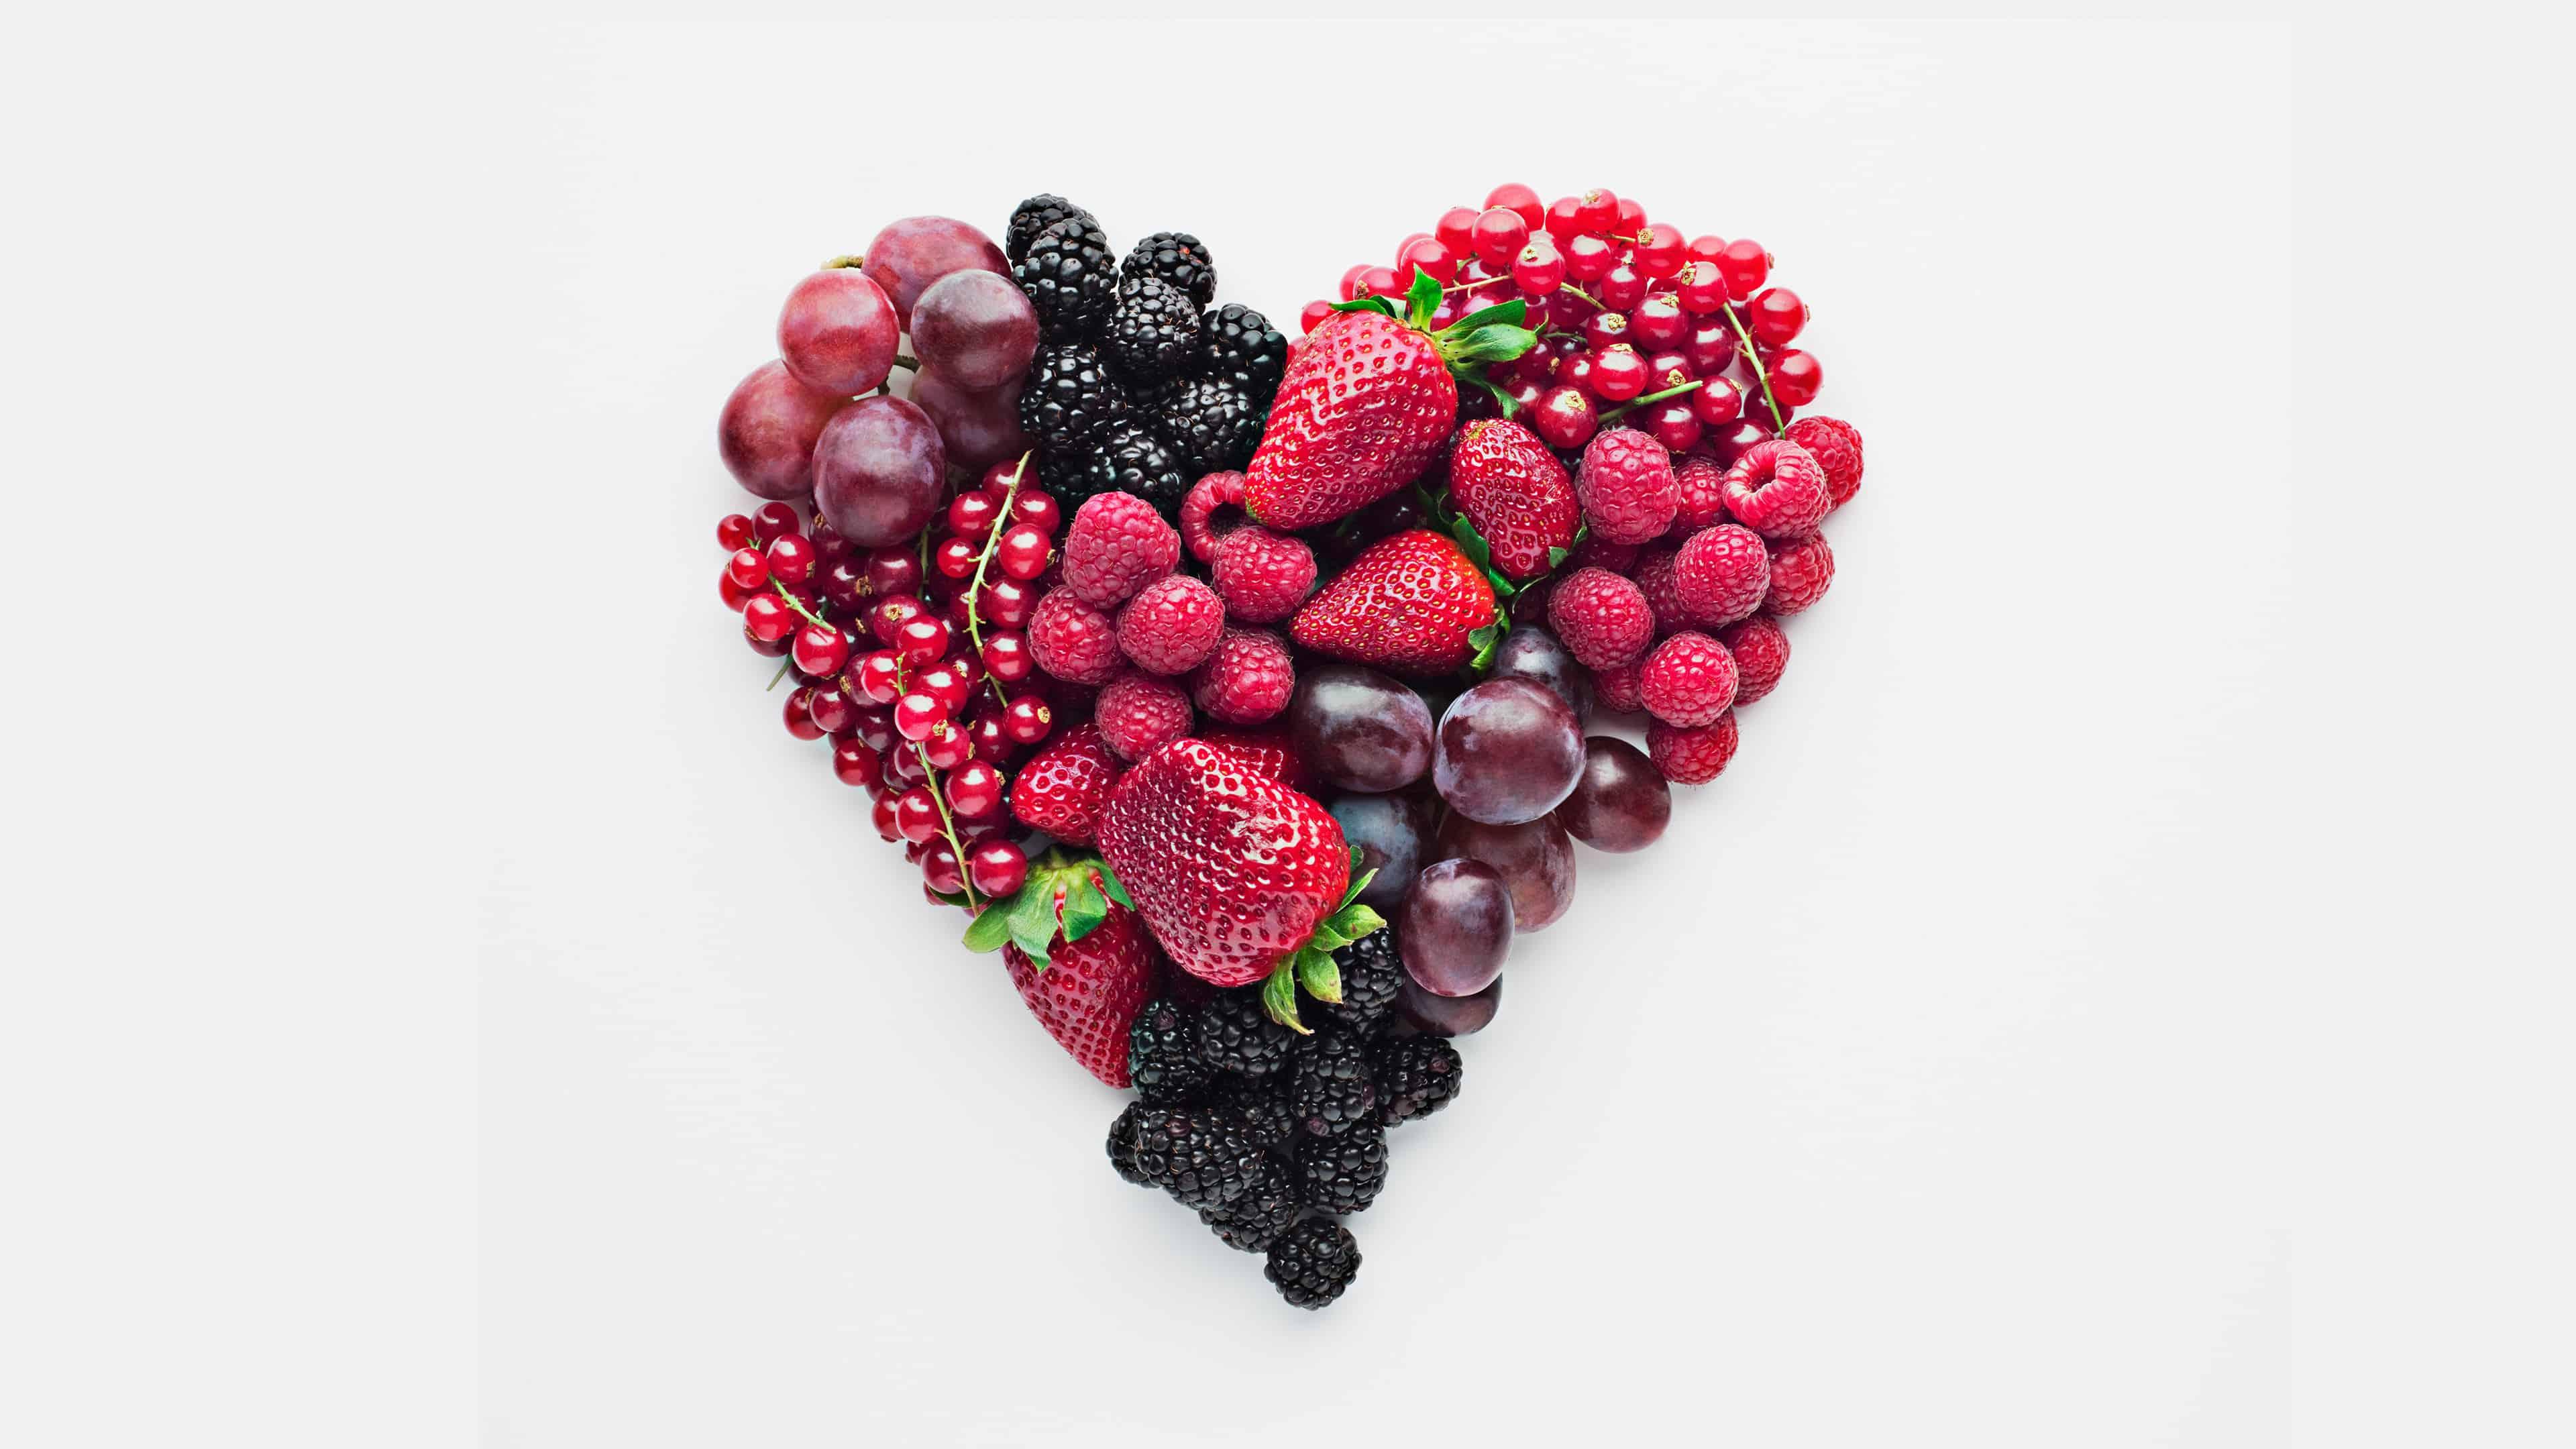 fruit heart uhd 4k wallpaper